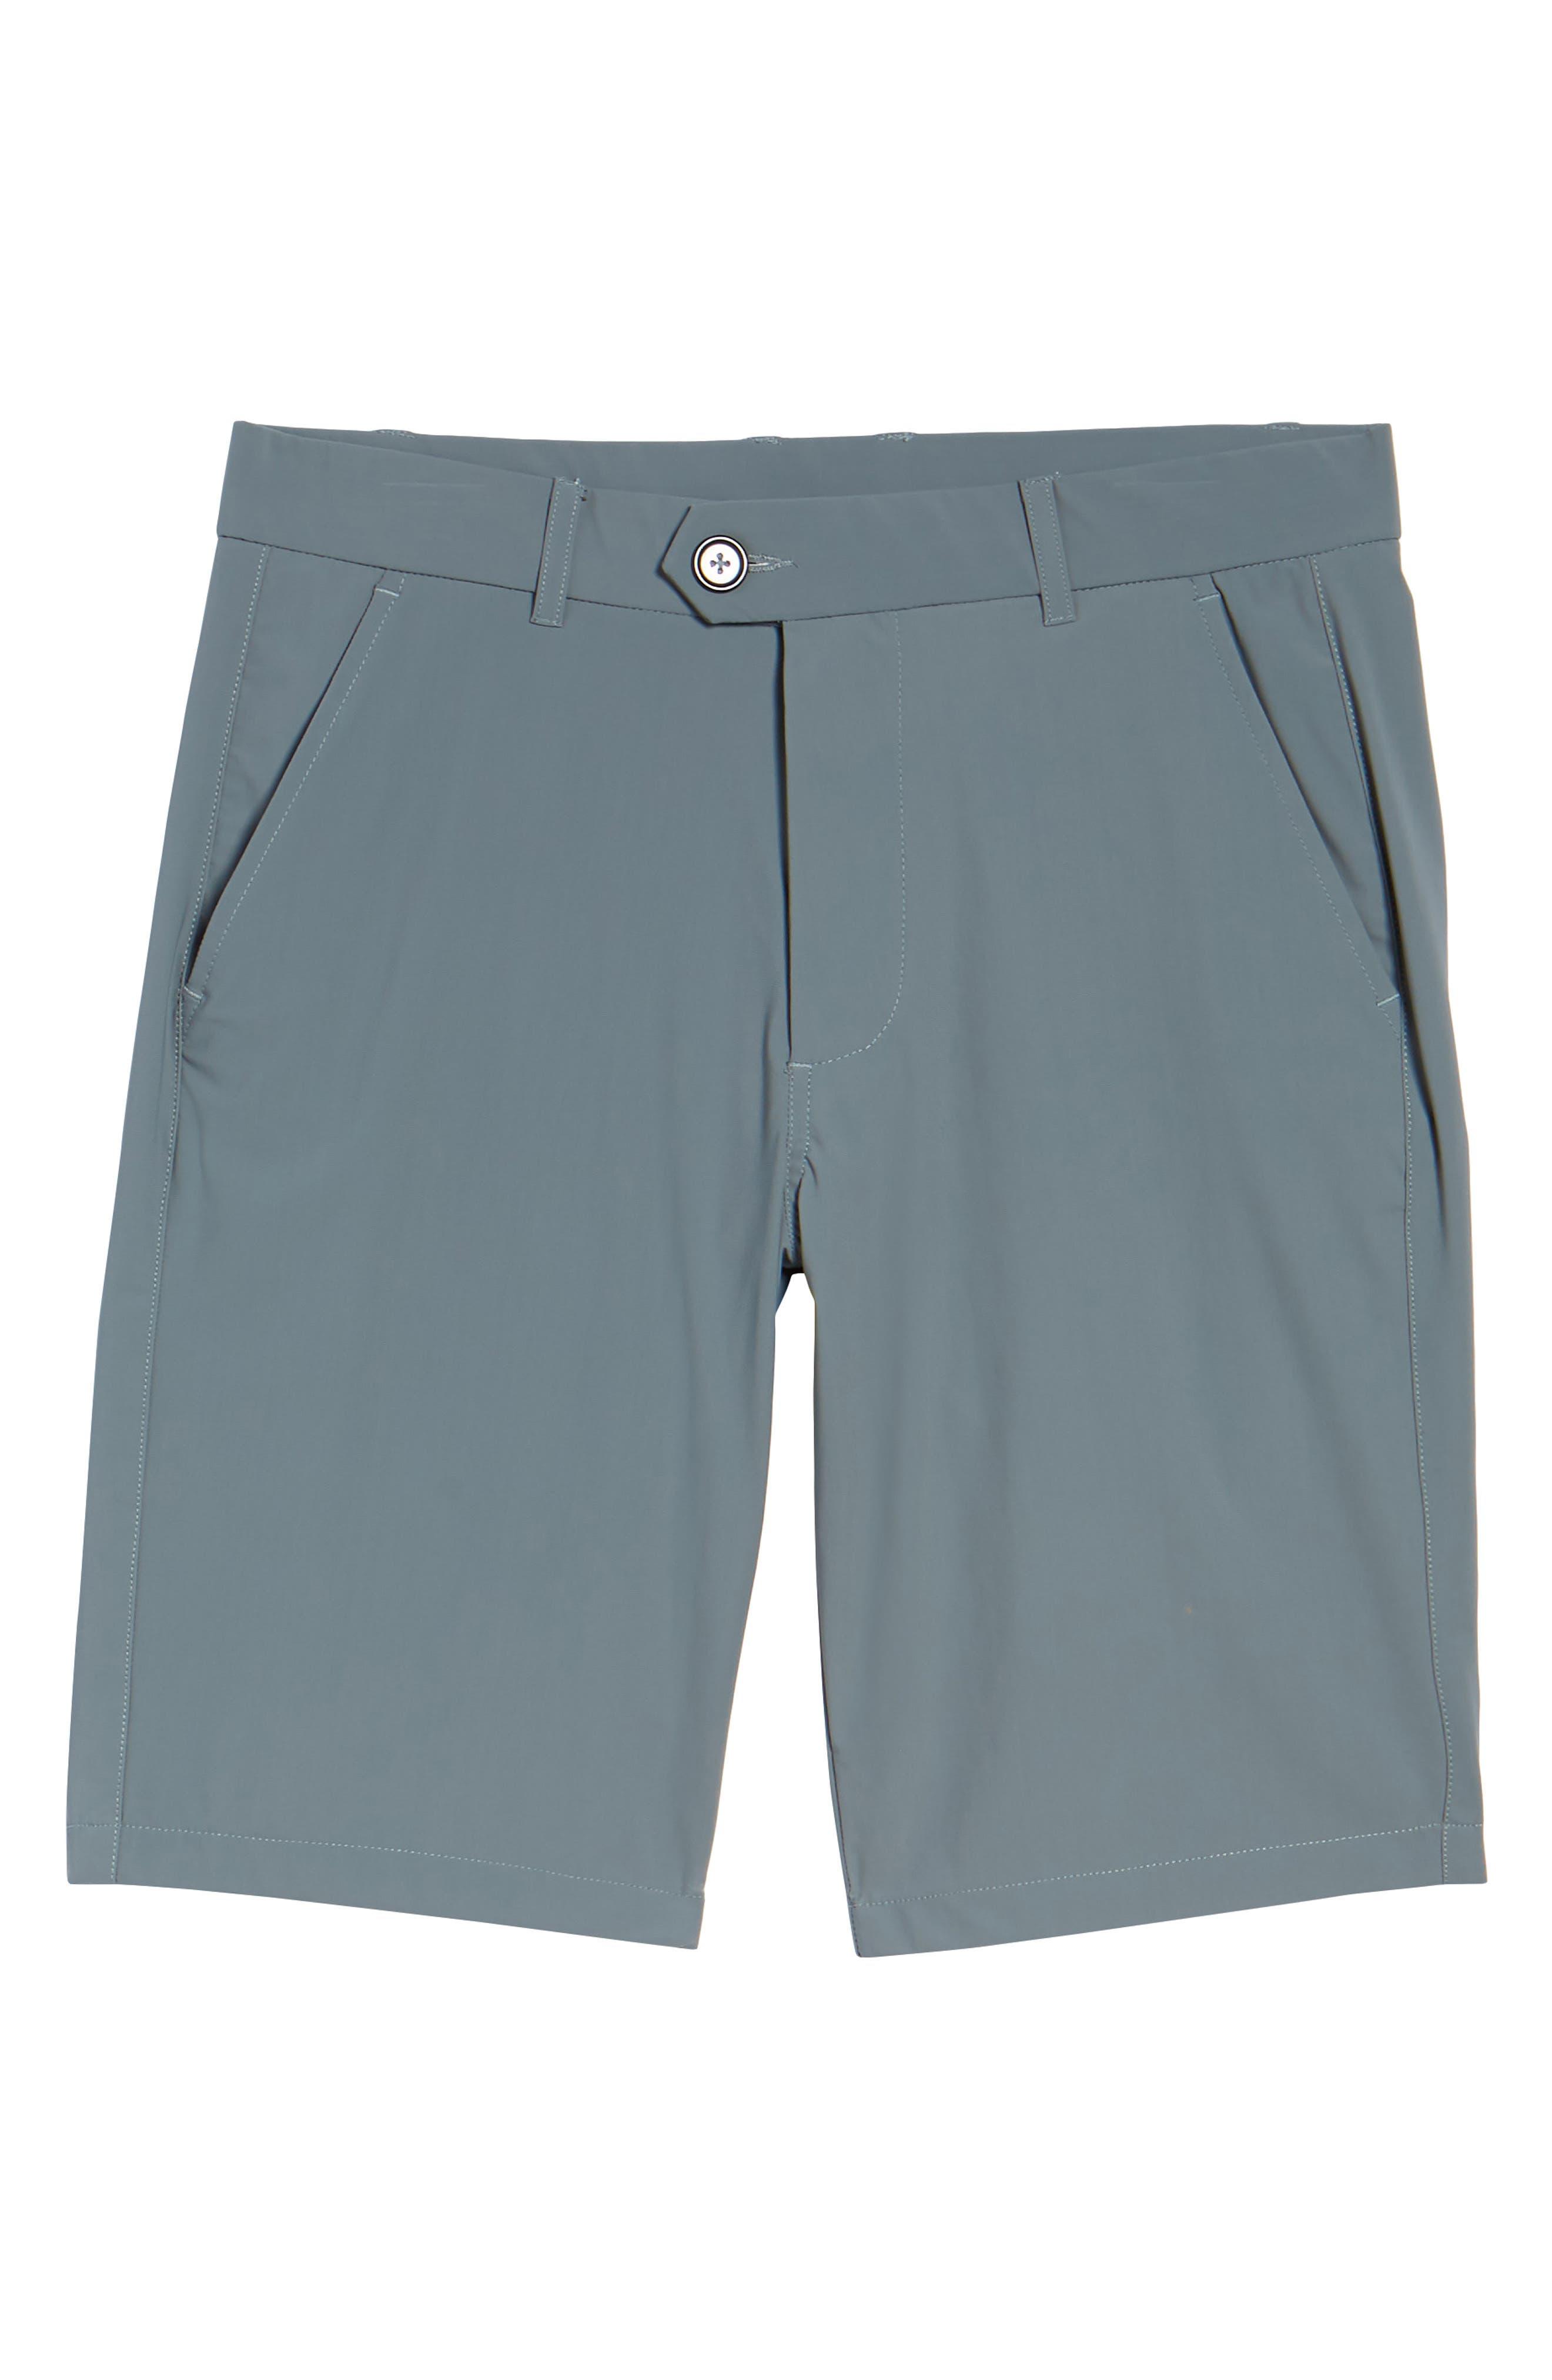 Montauk Shorts,                             Alternate thumbnail 6, color,                             Slate